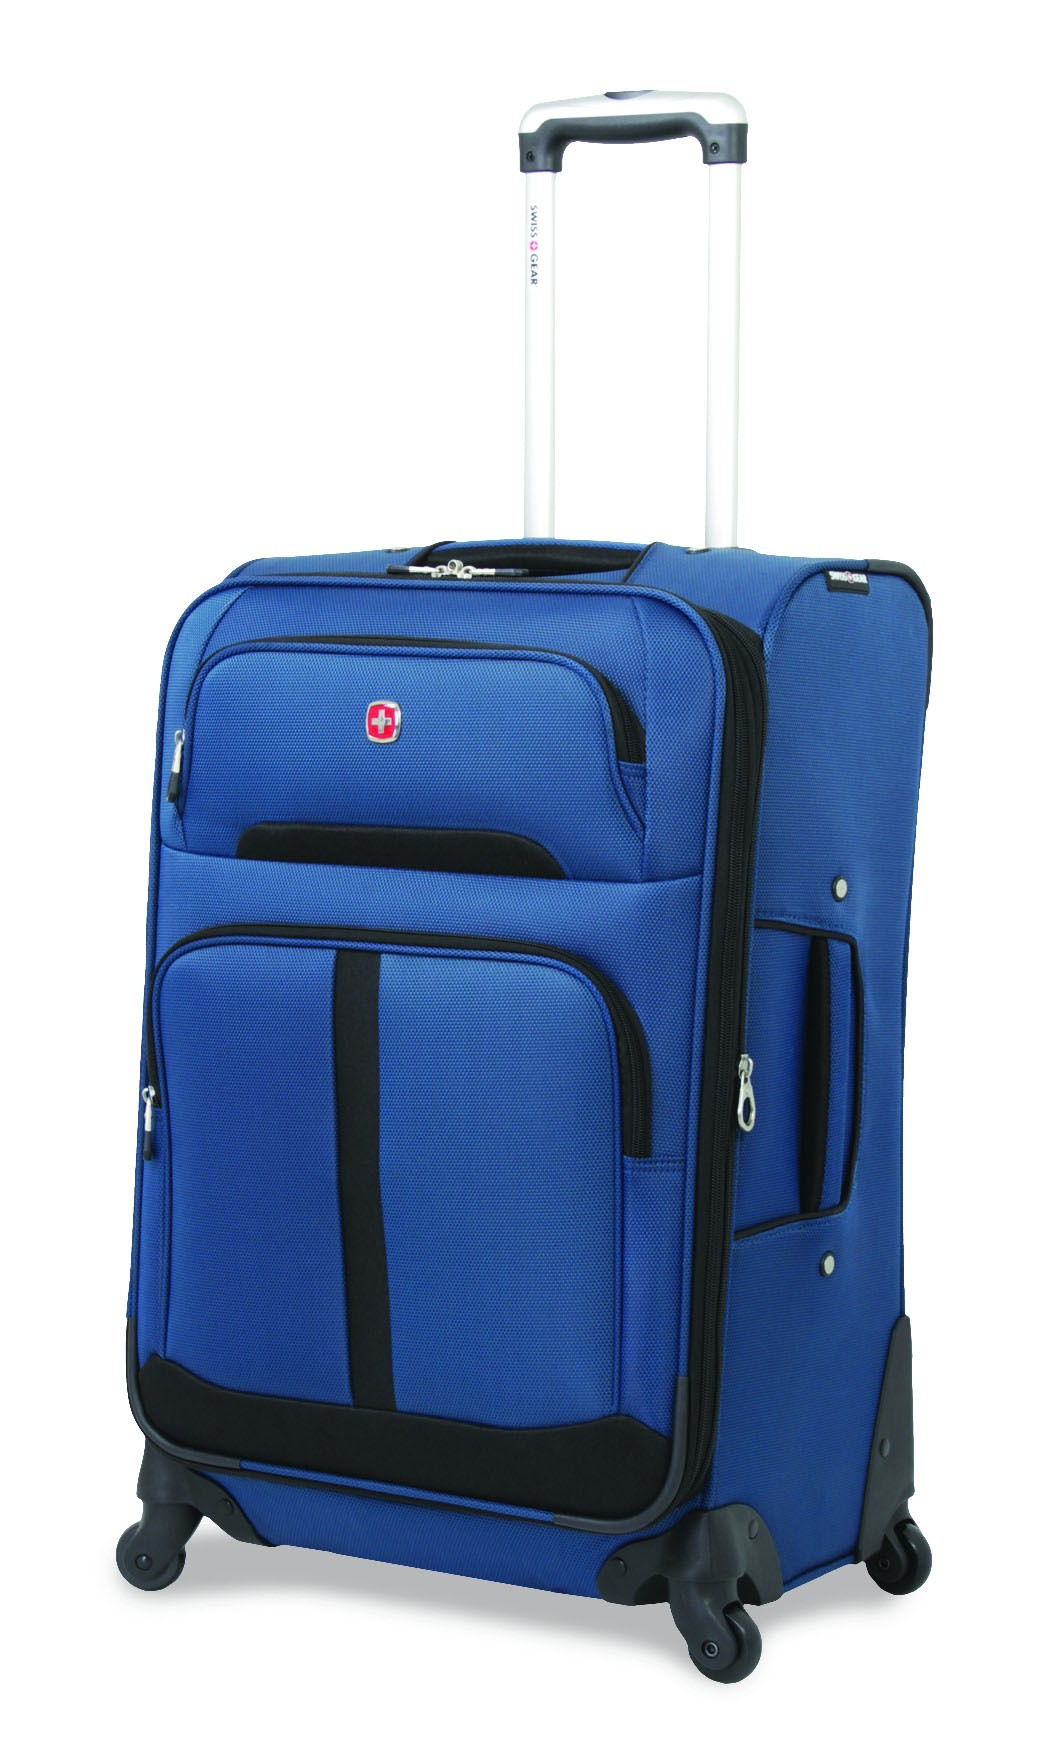 Чемодан SWISSGEAR ANDES, цвет синий/чёрный, полиэстер 48,5x28x77 см, 88 л  (6195302177)